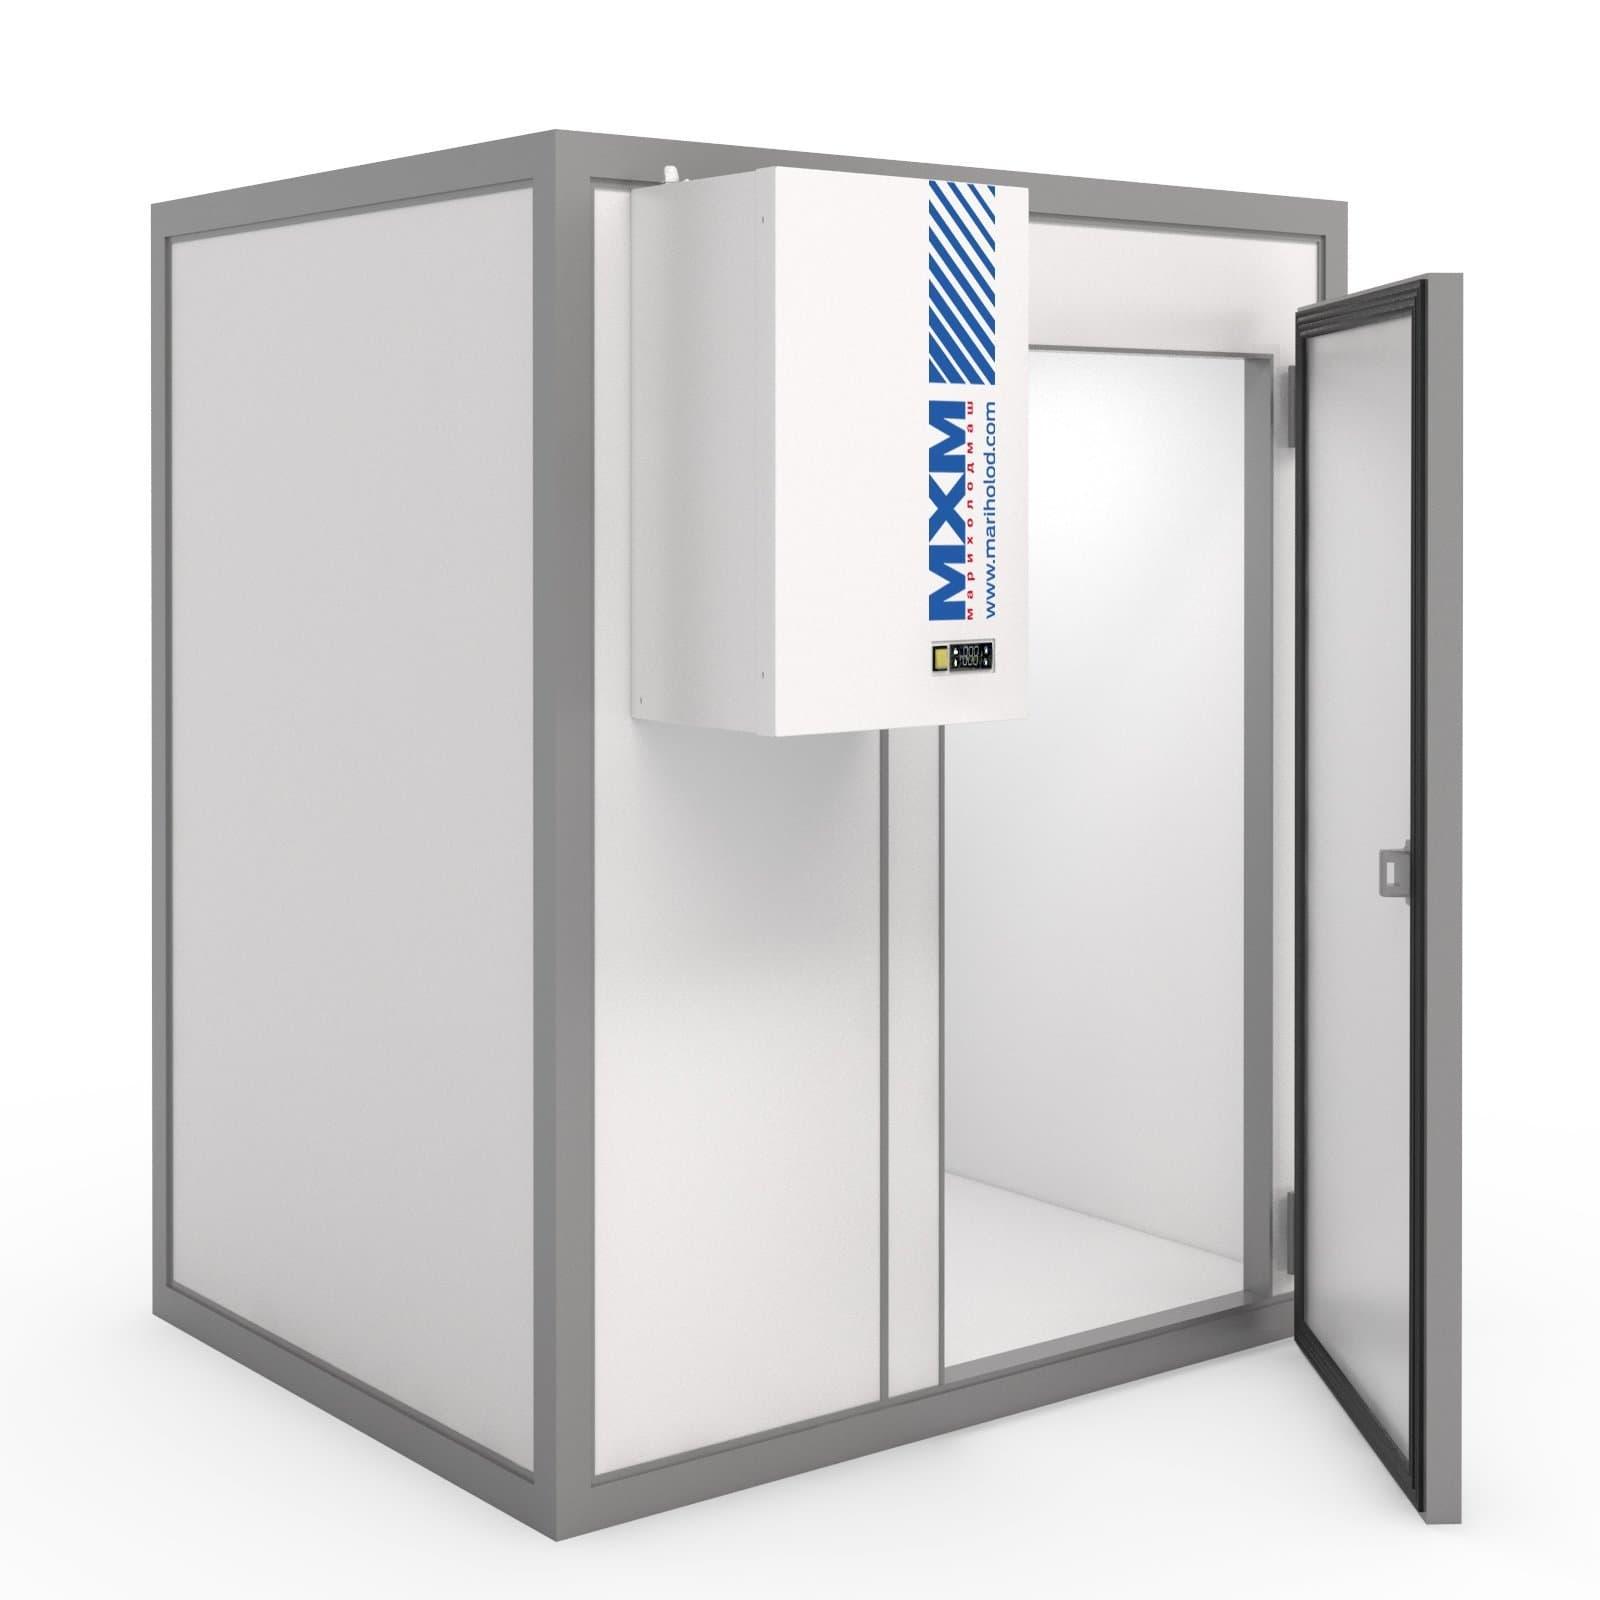 Камера холодильная МХМ КХН-25,67 1360×9460×2460